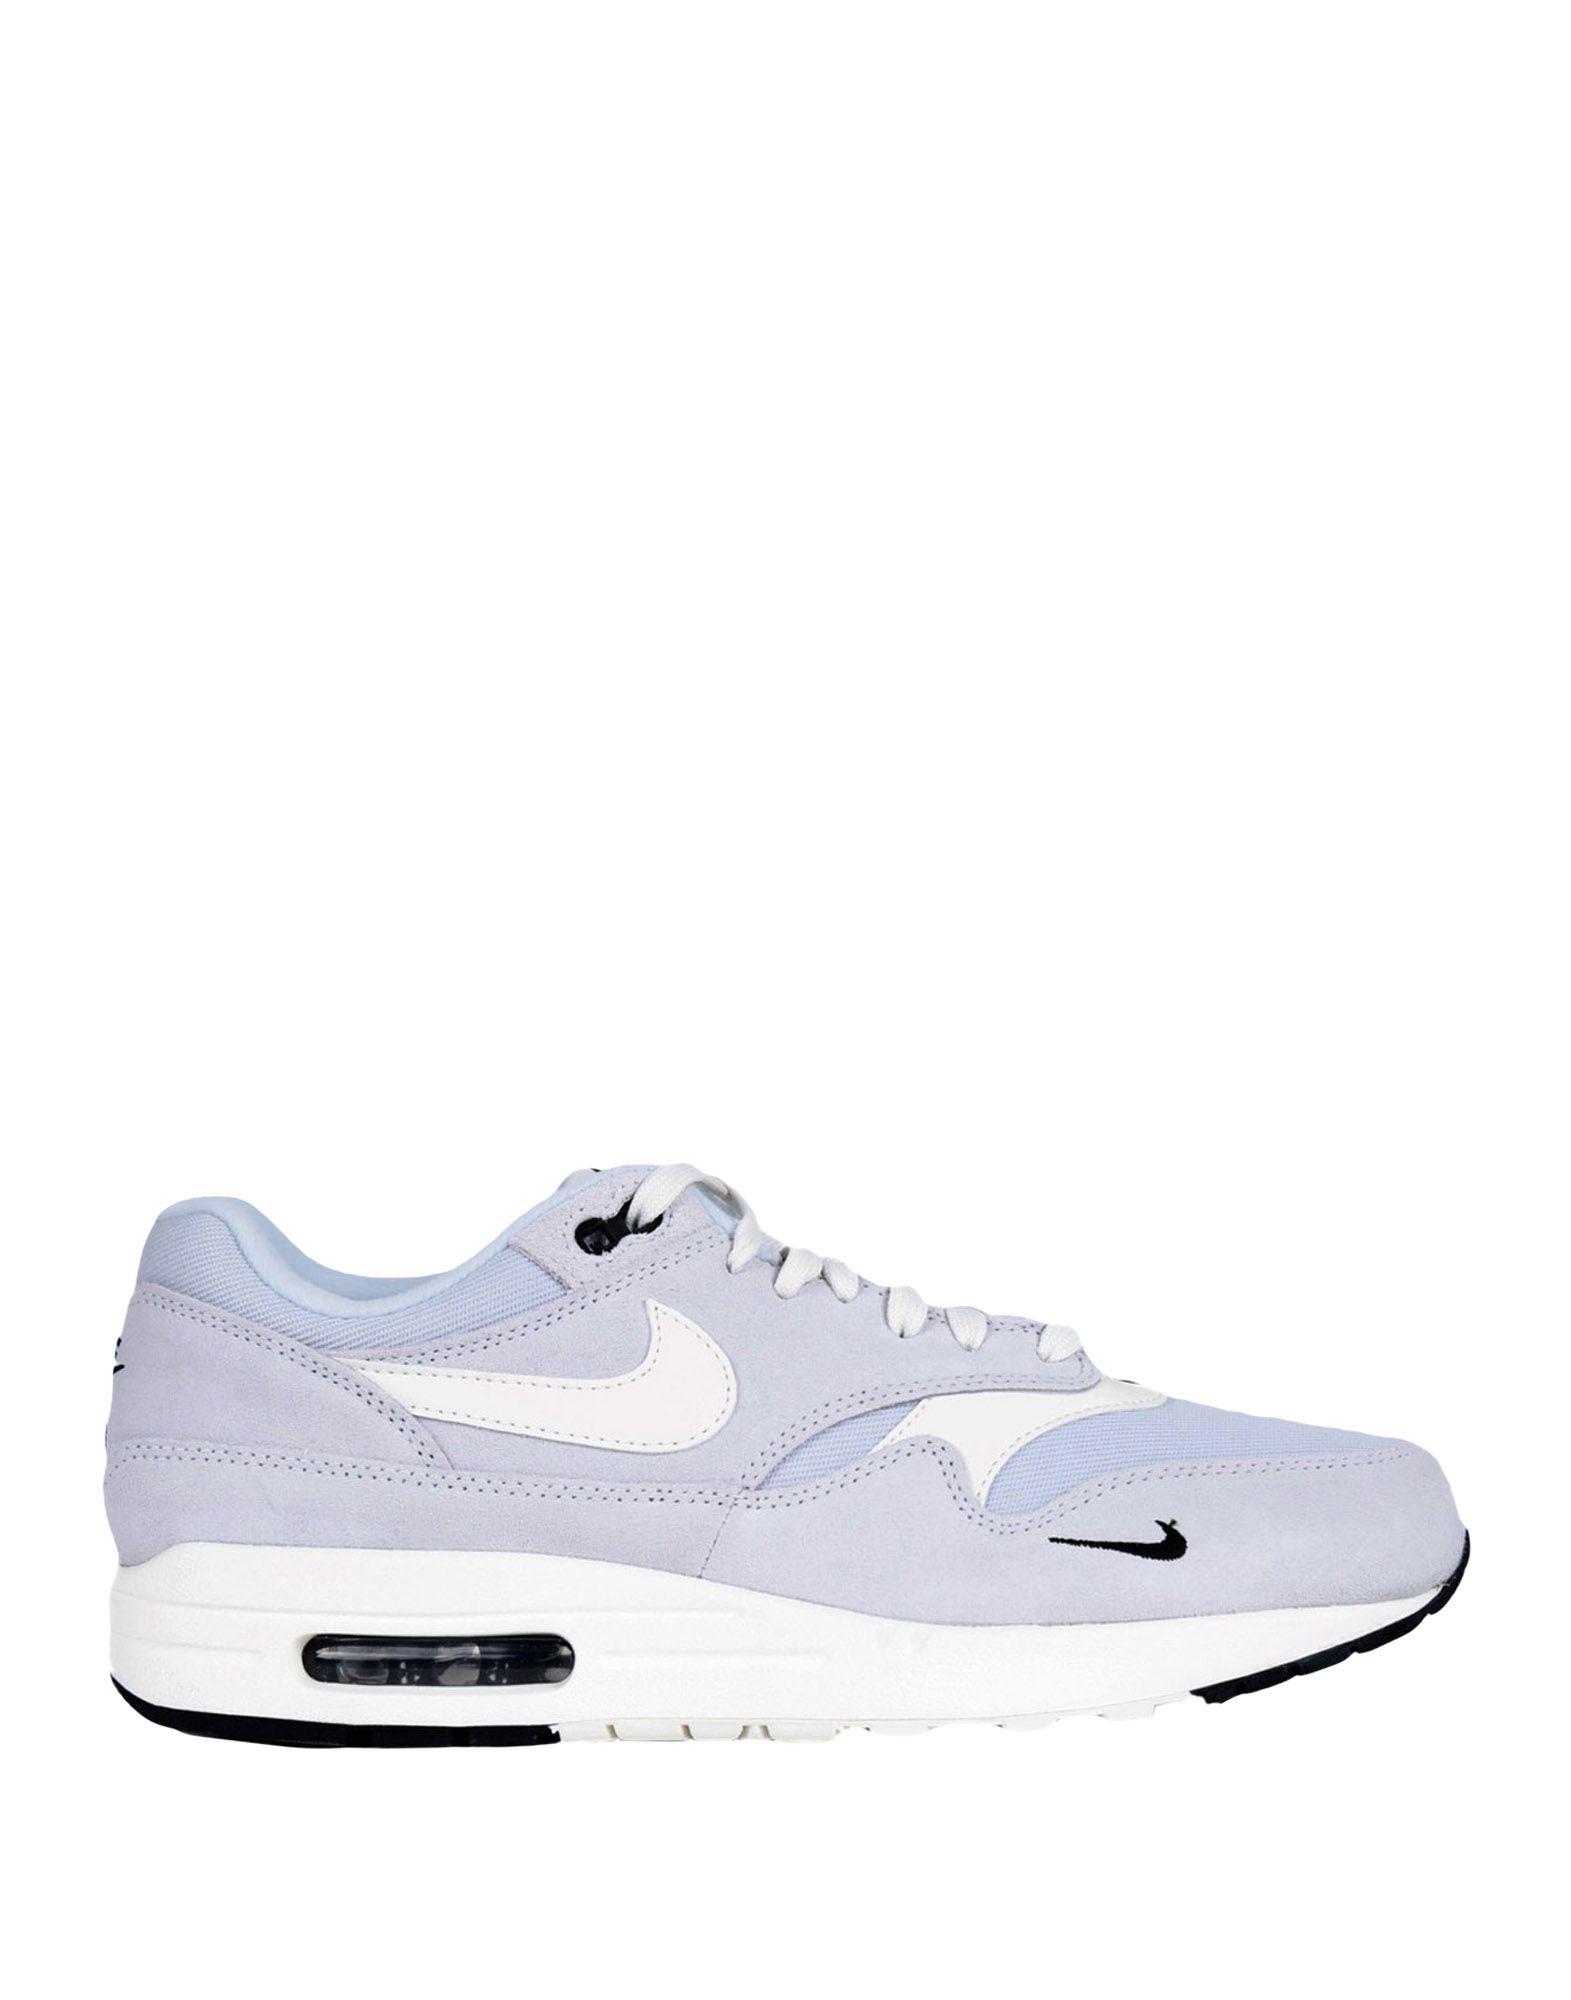 Nike   Air Max 1 Premium  11543917PO Gute Qualität beliebte Schuhe